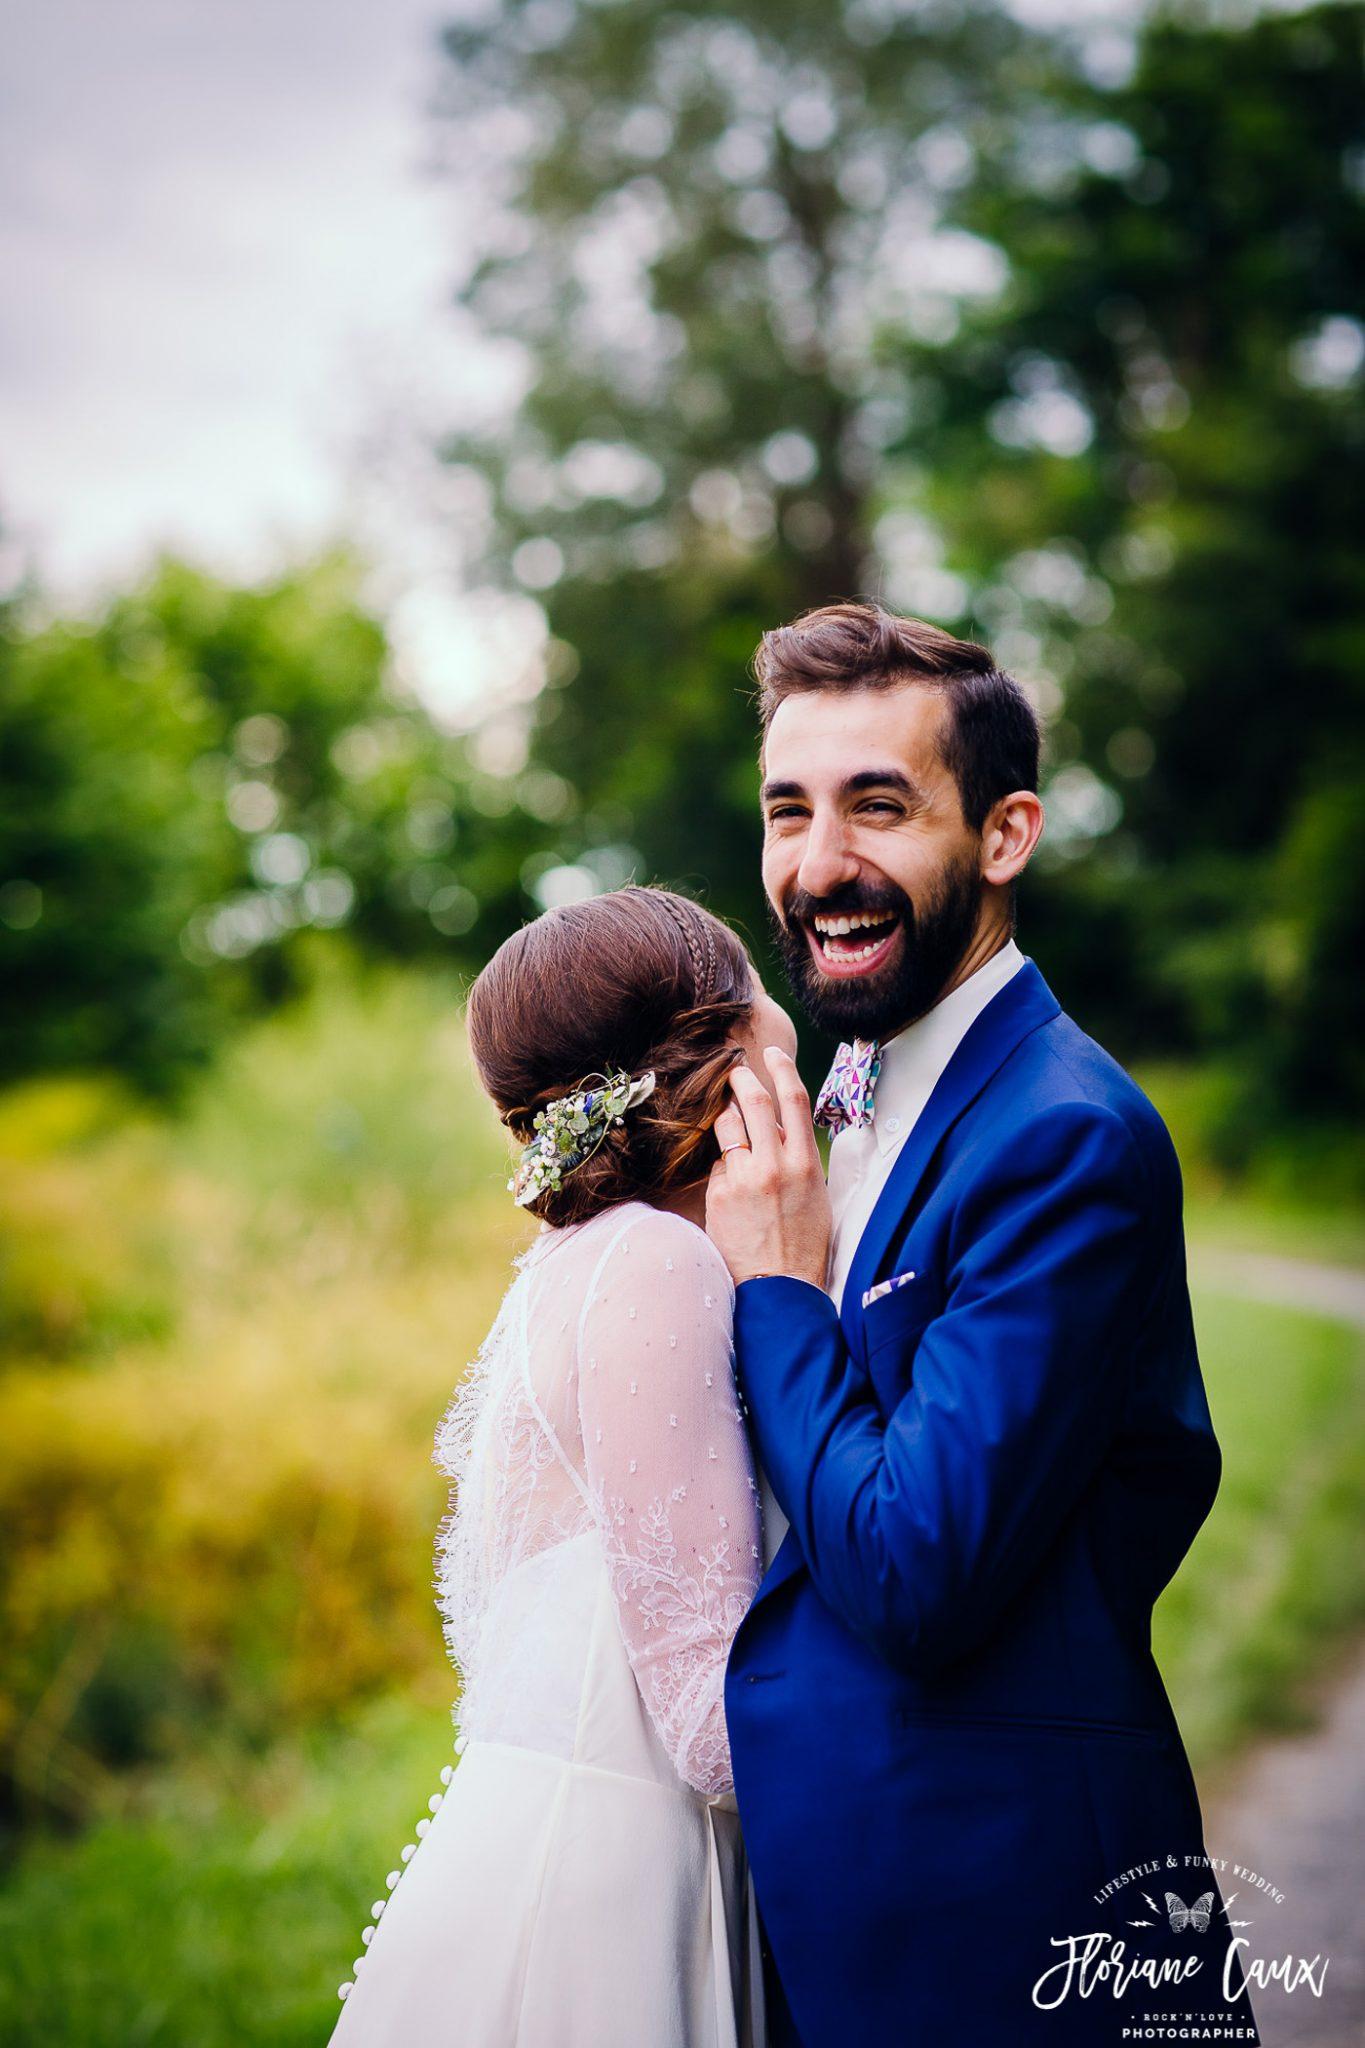 photographe-mariage-pays-basque-Floriane-Caux (44)